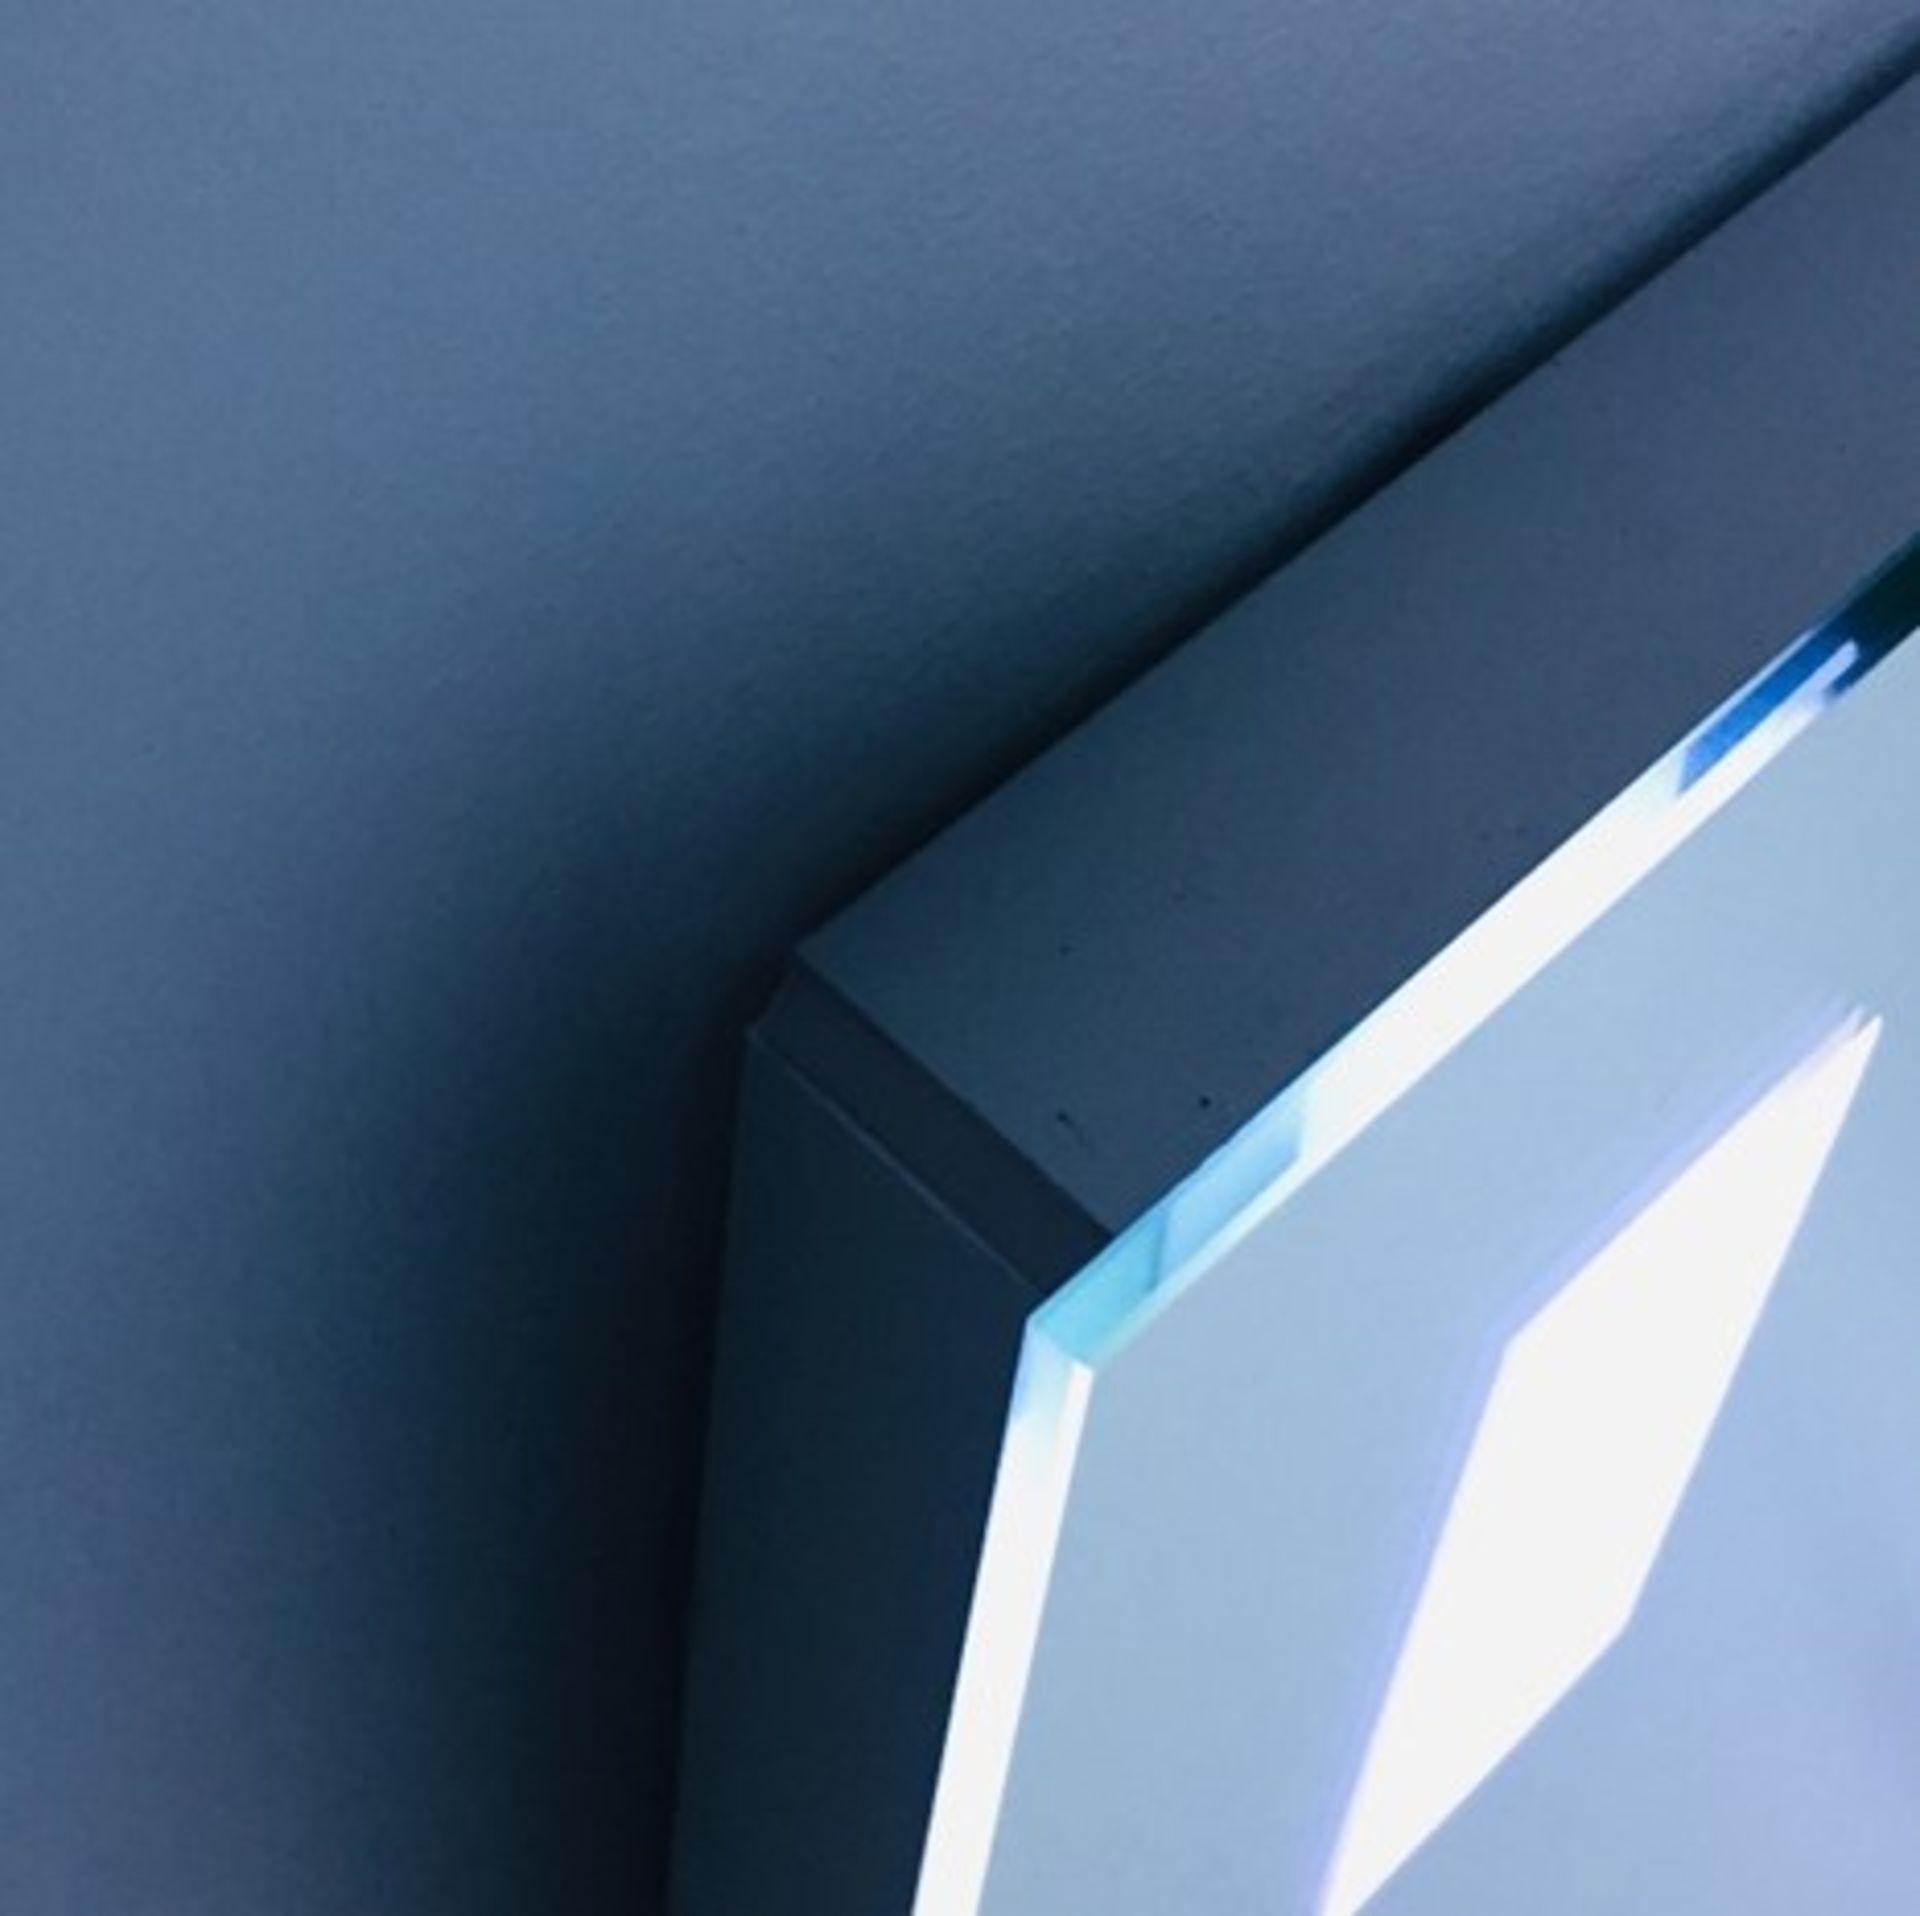 Lot 47 - x 5 Bathroom Illuminated LED Mirrors